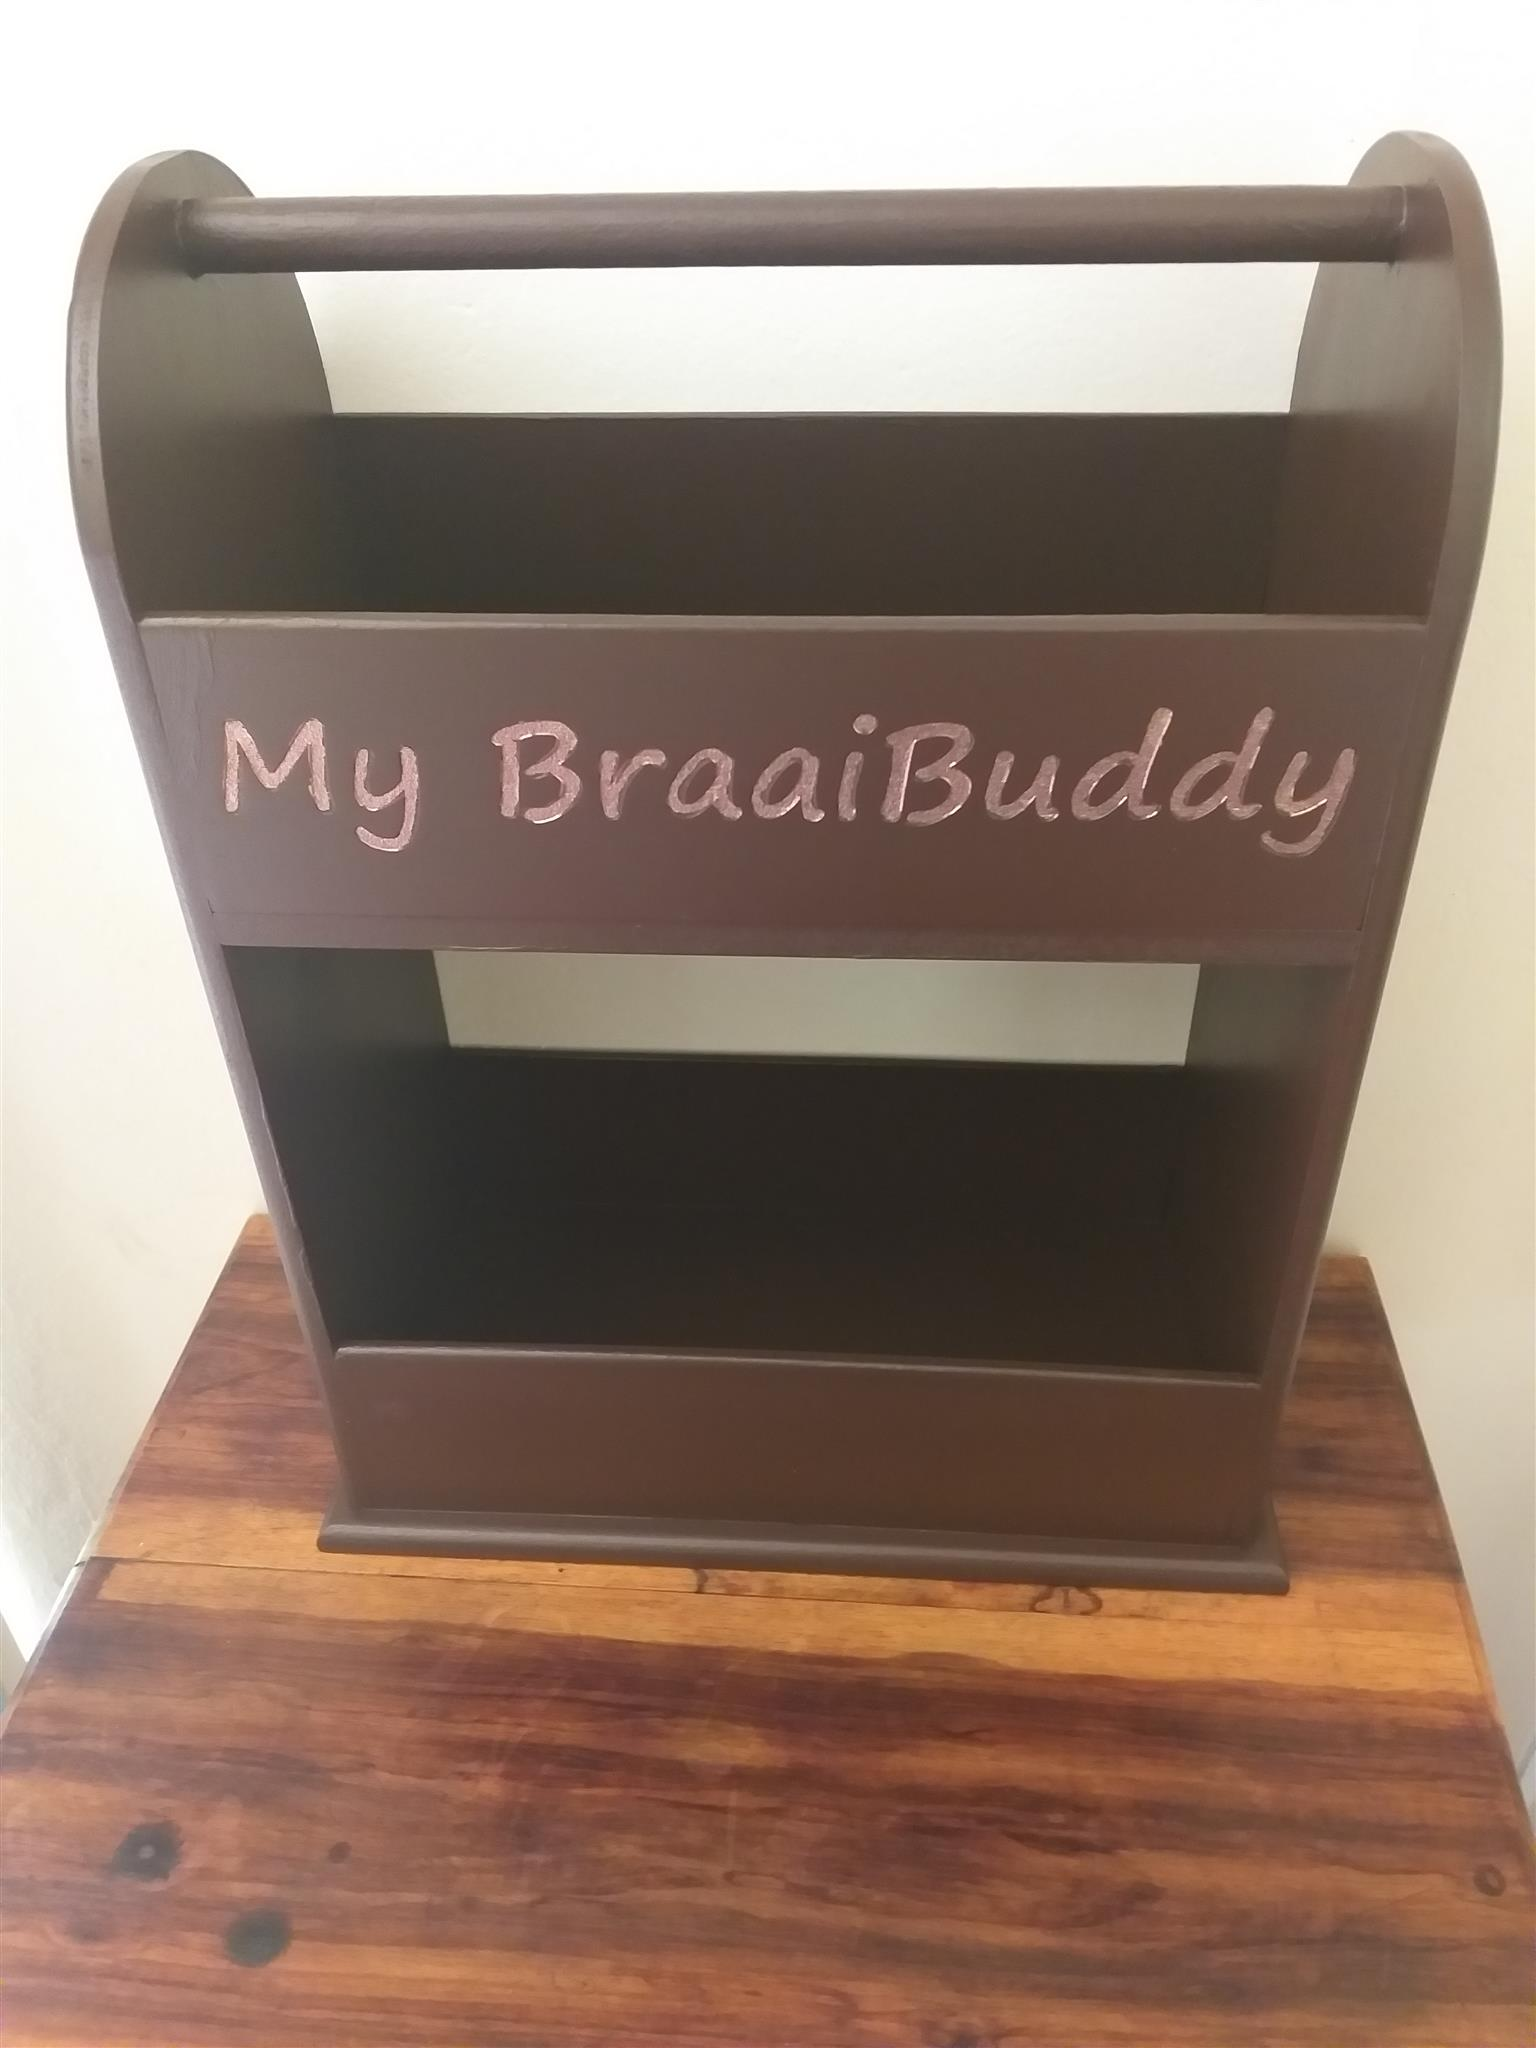 BraaiBuddy / Spicerack